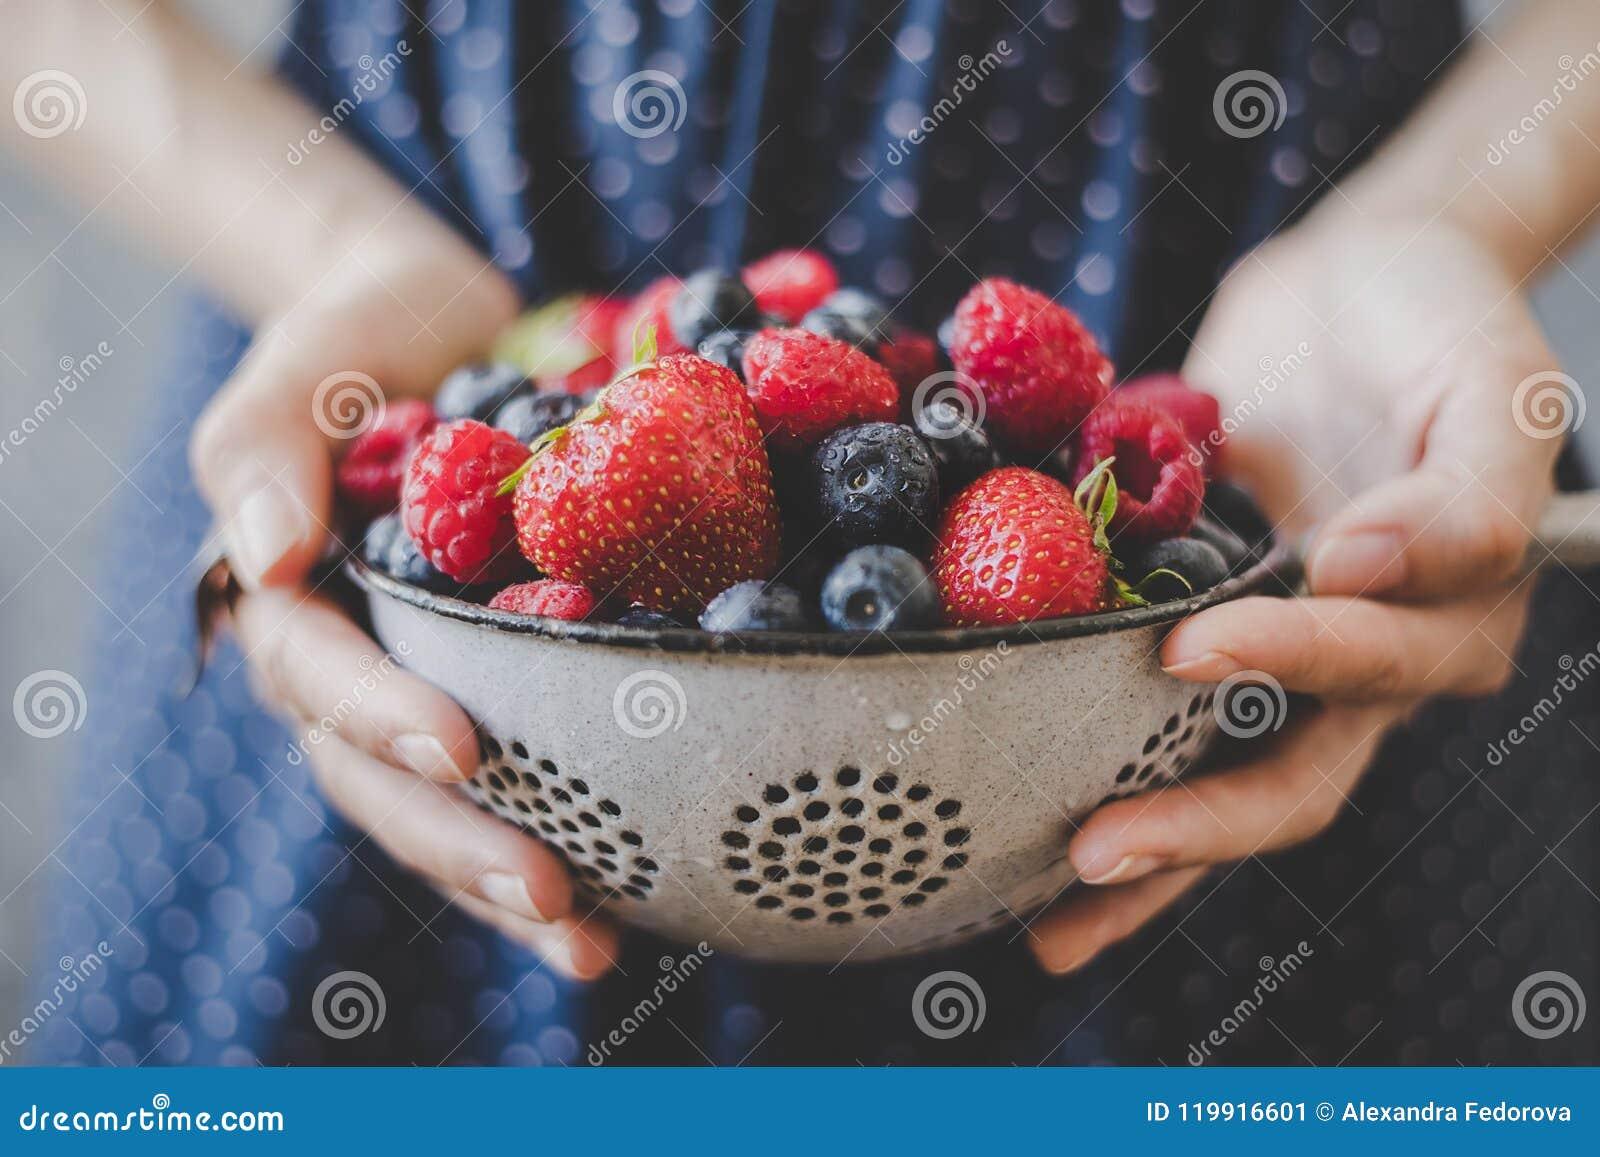 Organic Fresh Berries. Hands Holding Fresh Juicy Berries ...